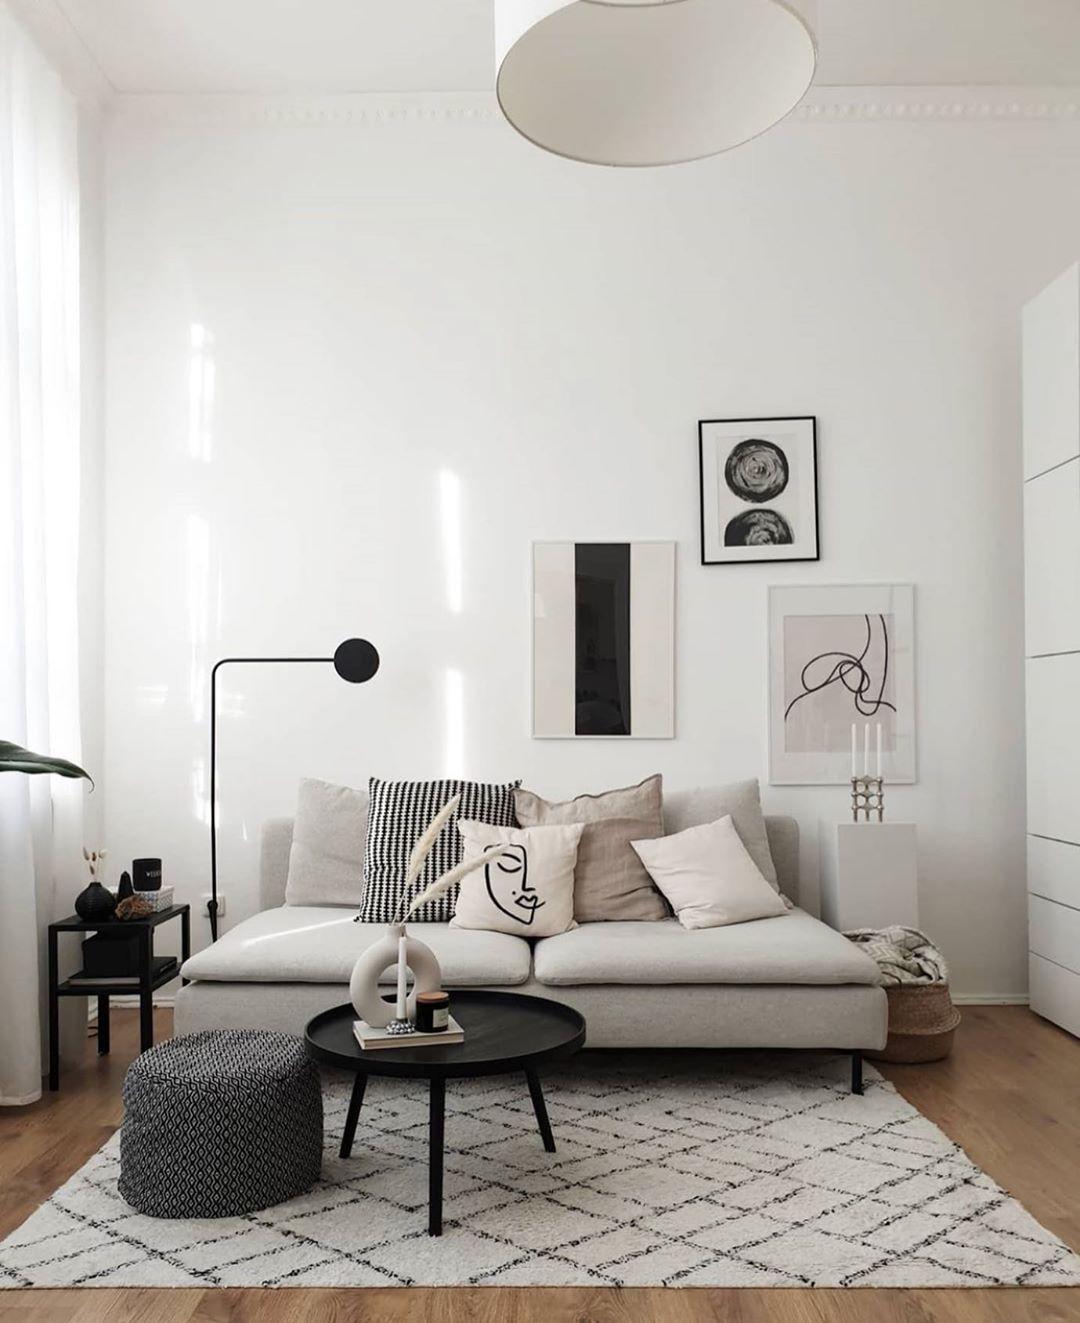 487 Likes 0 Comments Mynordicroom Mynordicroom On Instagram In 2020 Living Room Scandinavian Scandinavian Design Living Room Scandinavian Decor Living Room